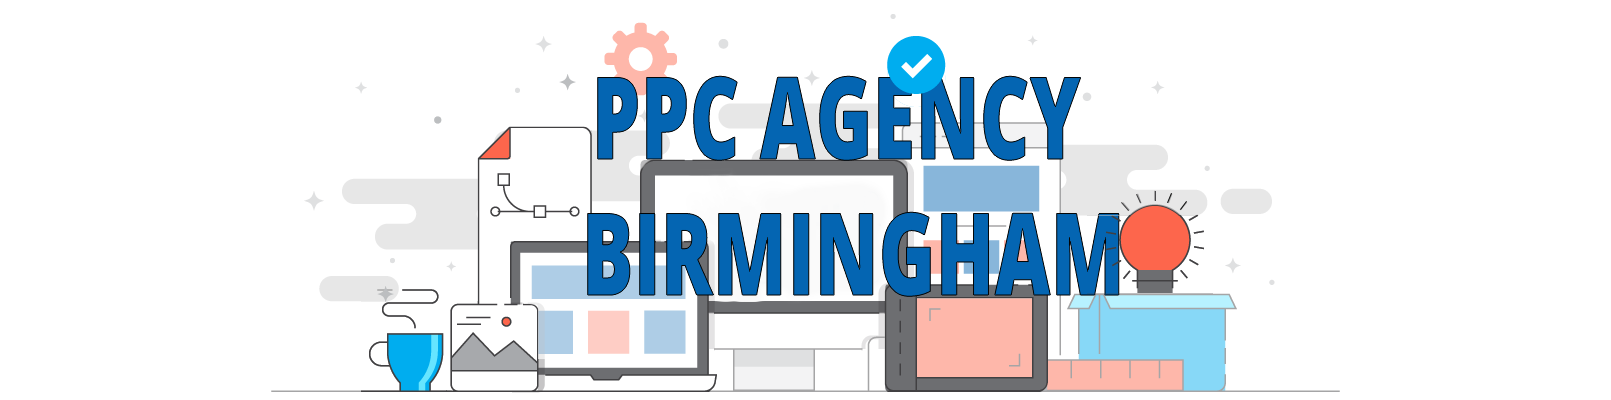 seek social ppc agency birmingham header with transparent background